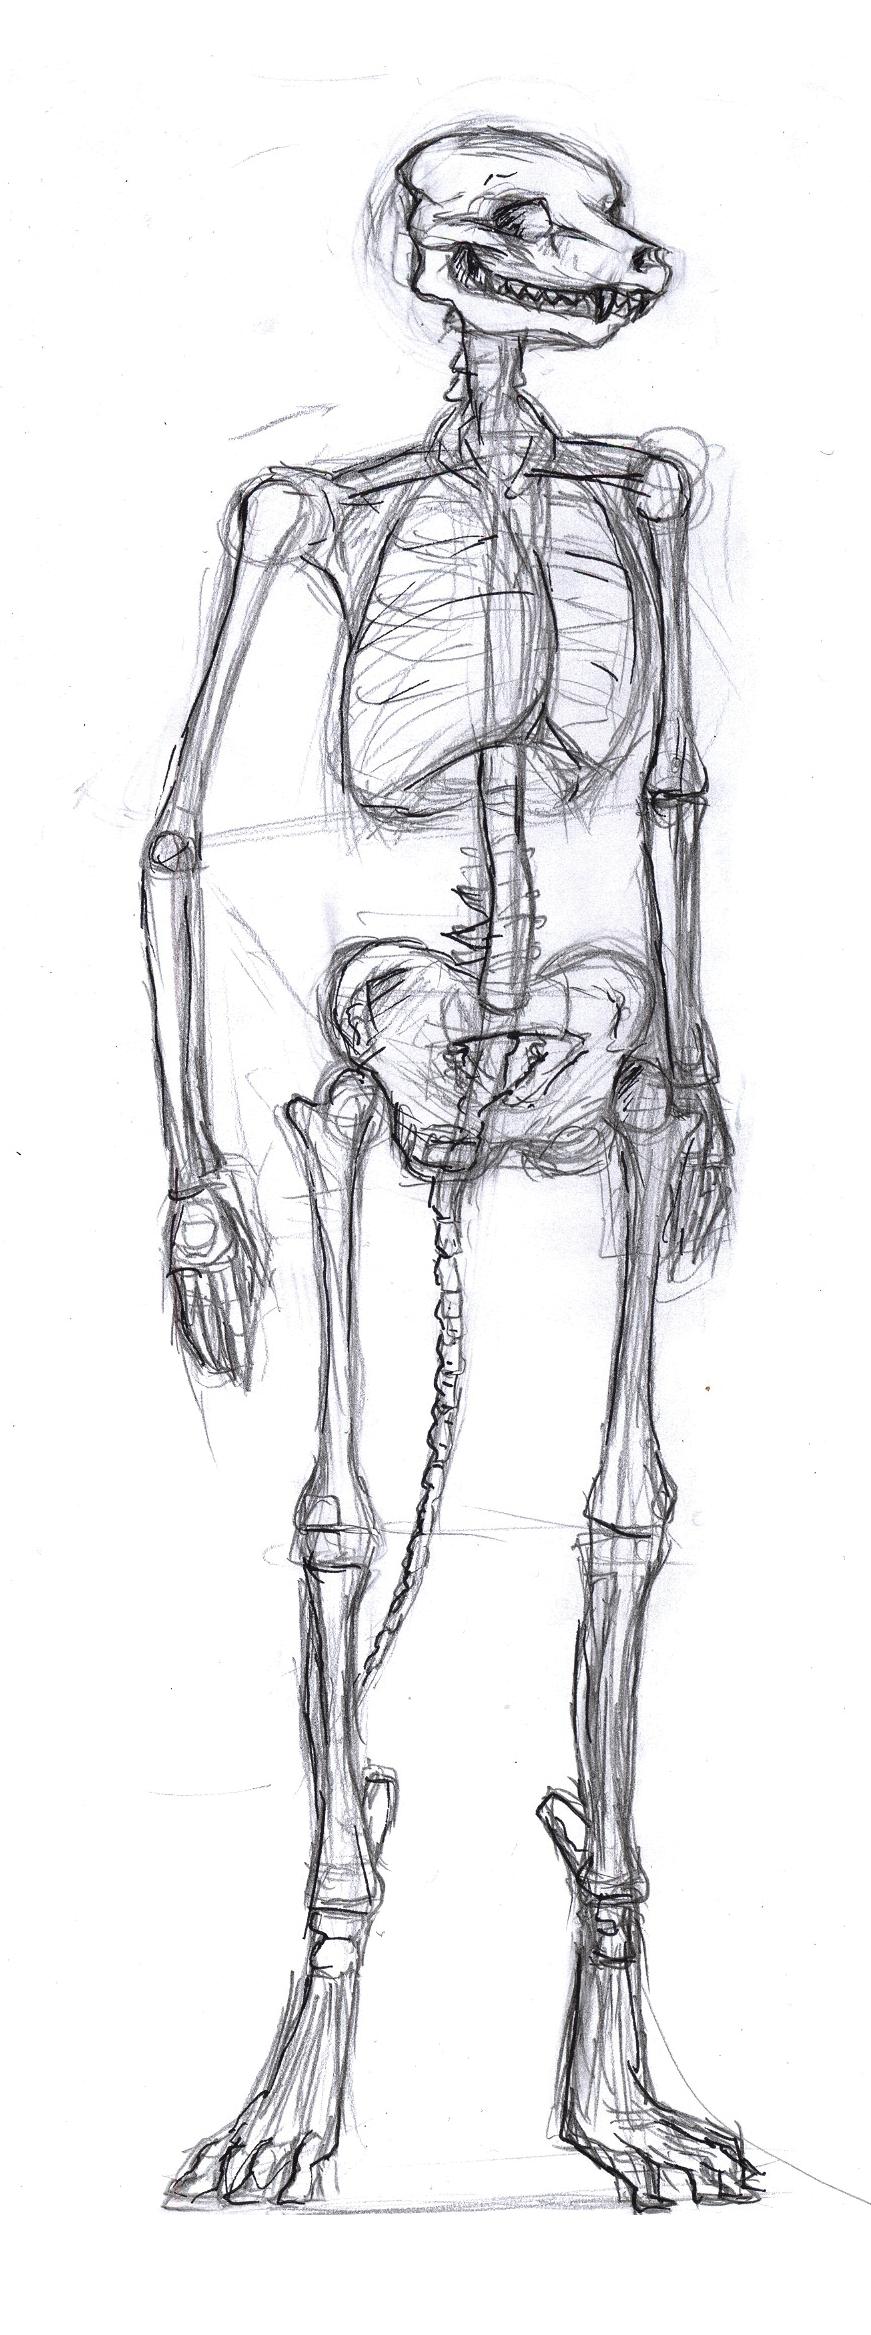 Anthro skeleton anatomy by danwolf15 on DeviantArt